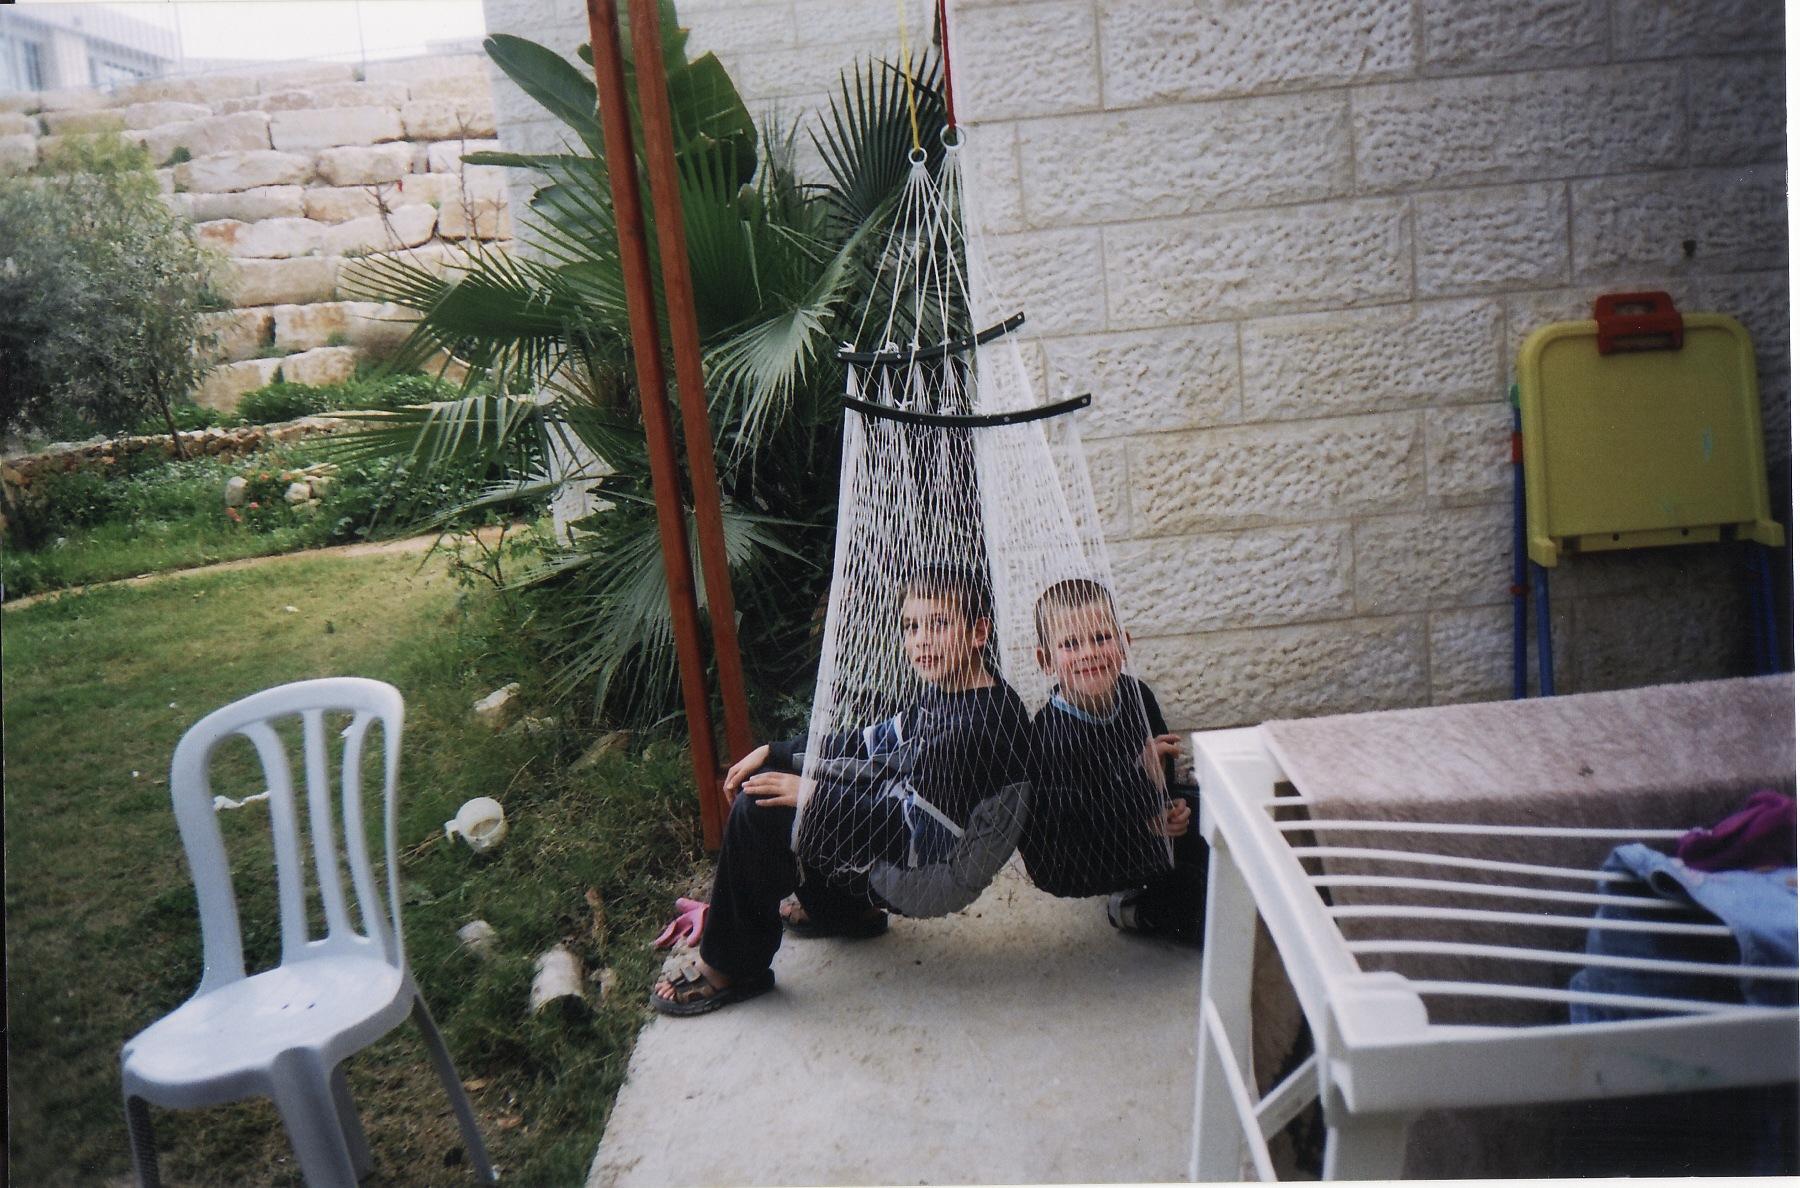 קיץ תשסה ישי בן 10 עם האחיין אליעד באבד